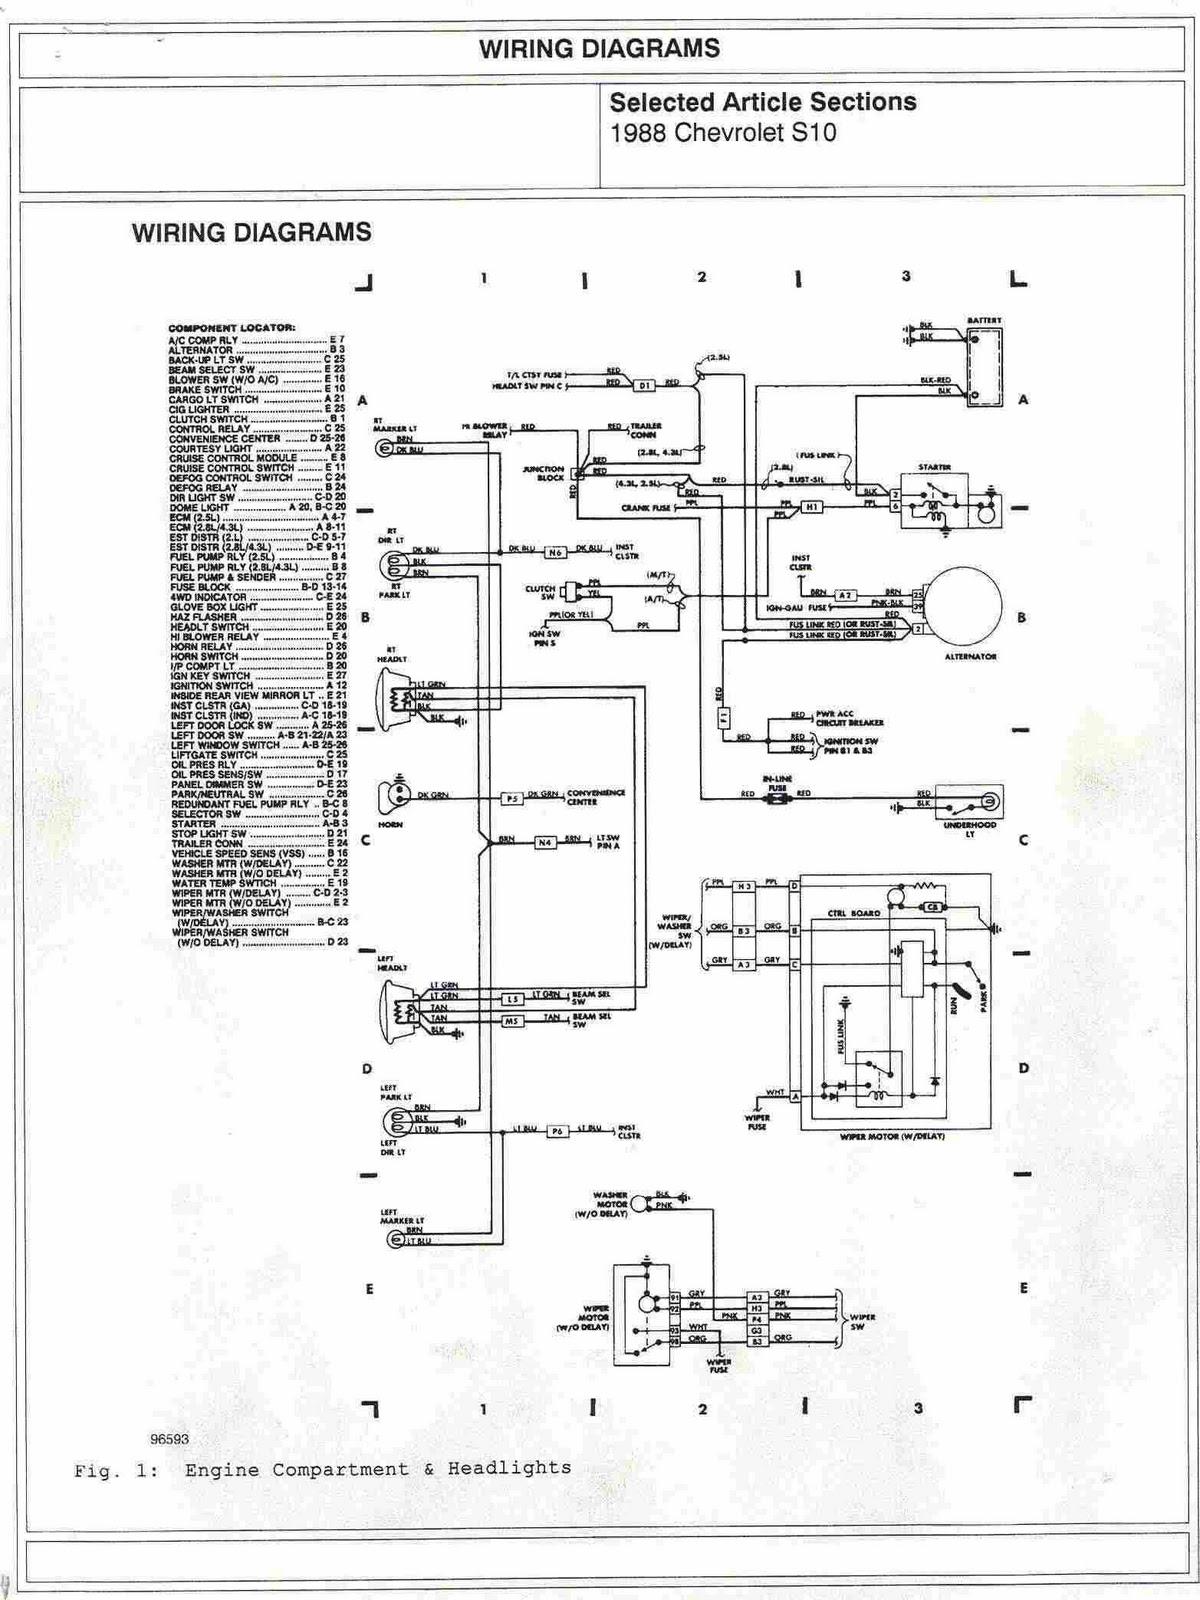 1996 s10 headlight wiring diagram 1990 chevy s10 blazer wiring diagramrh svlc us [ 1200 x 1600 Pixel ]